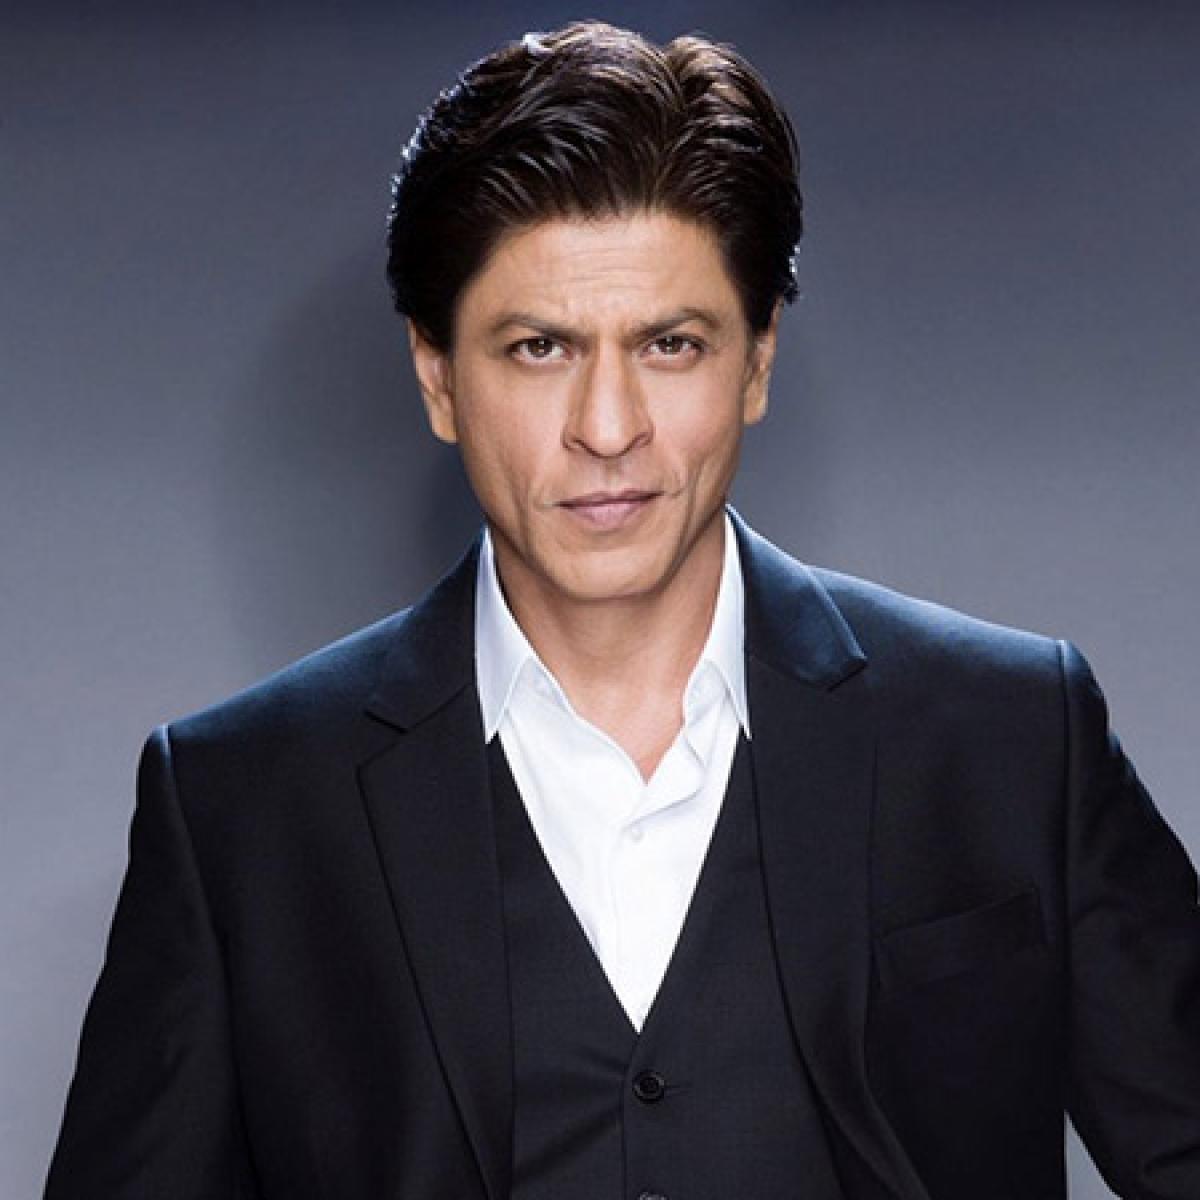 Shah Rukh Khan roped in as Bill in the Hindi remake of 'Kill Bill'?